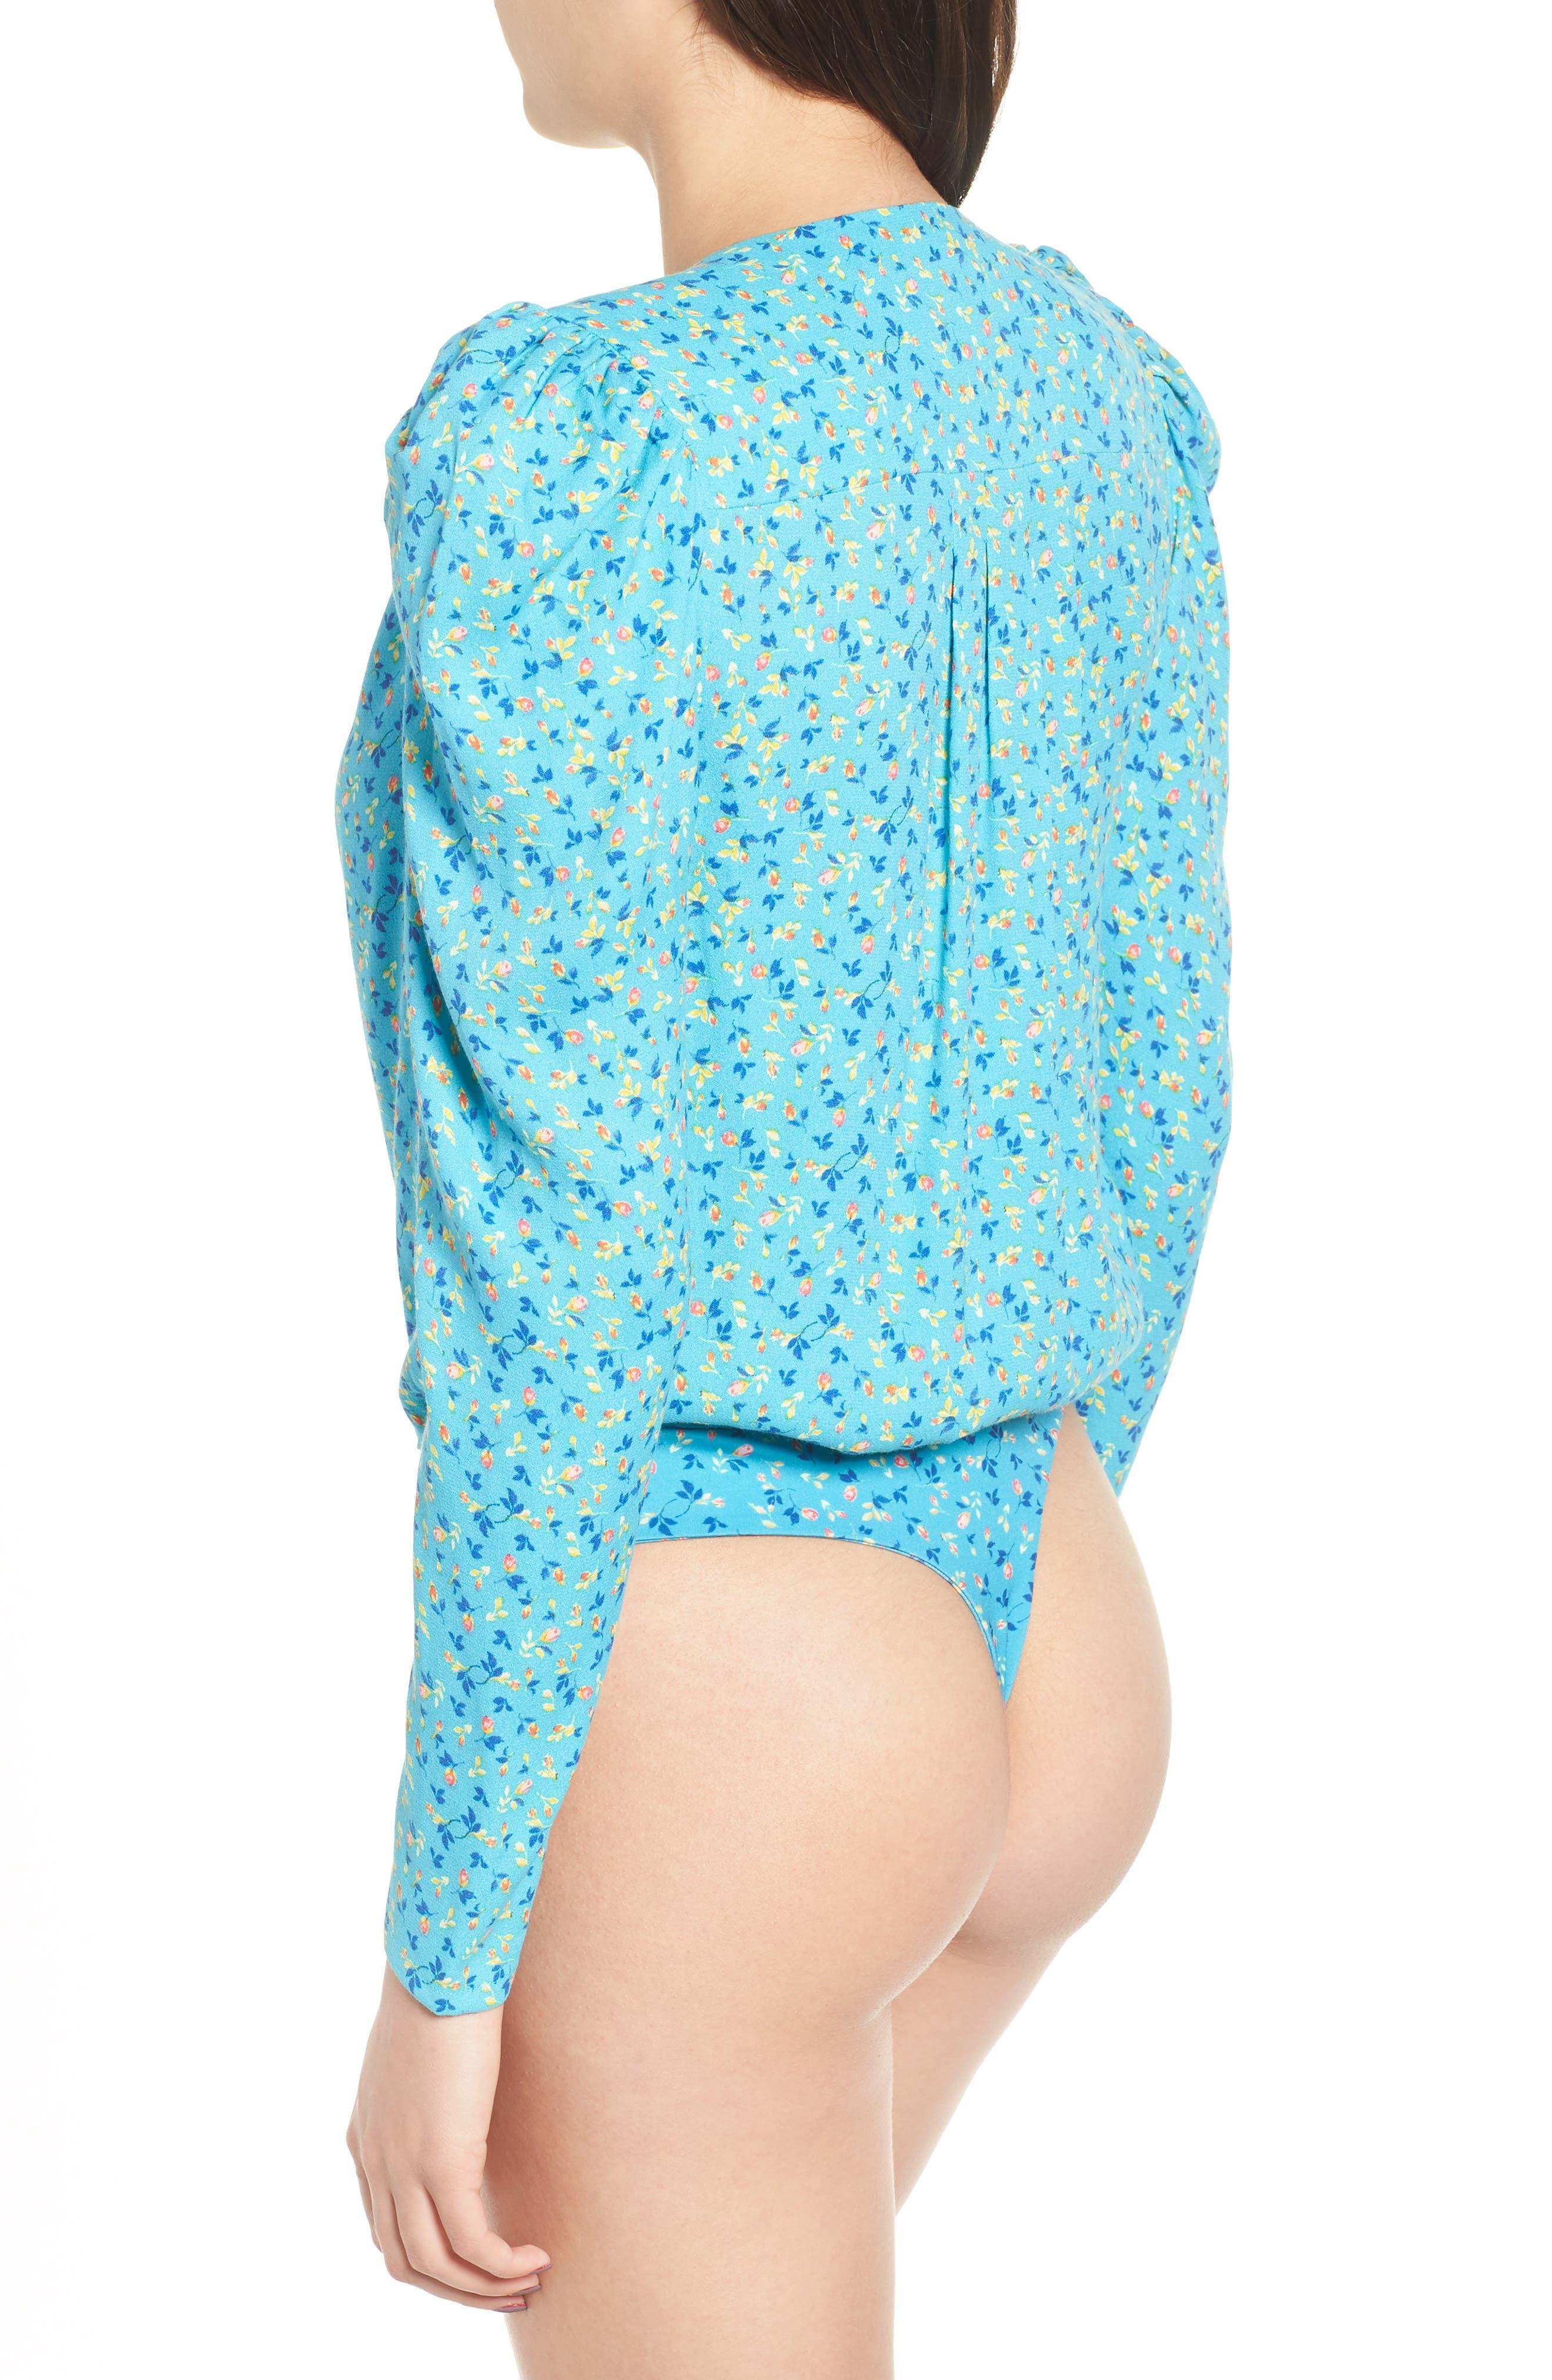 Nora Thong Bodysuit,                             Alternate thumbnail 3, color,                             Blue Ditsy